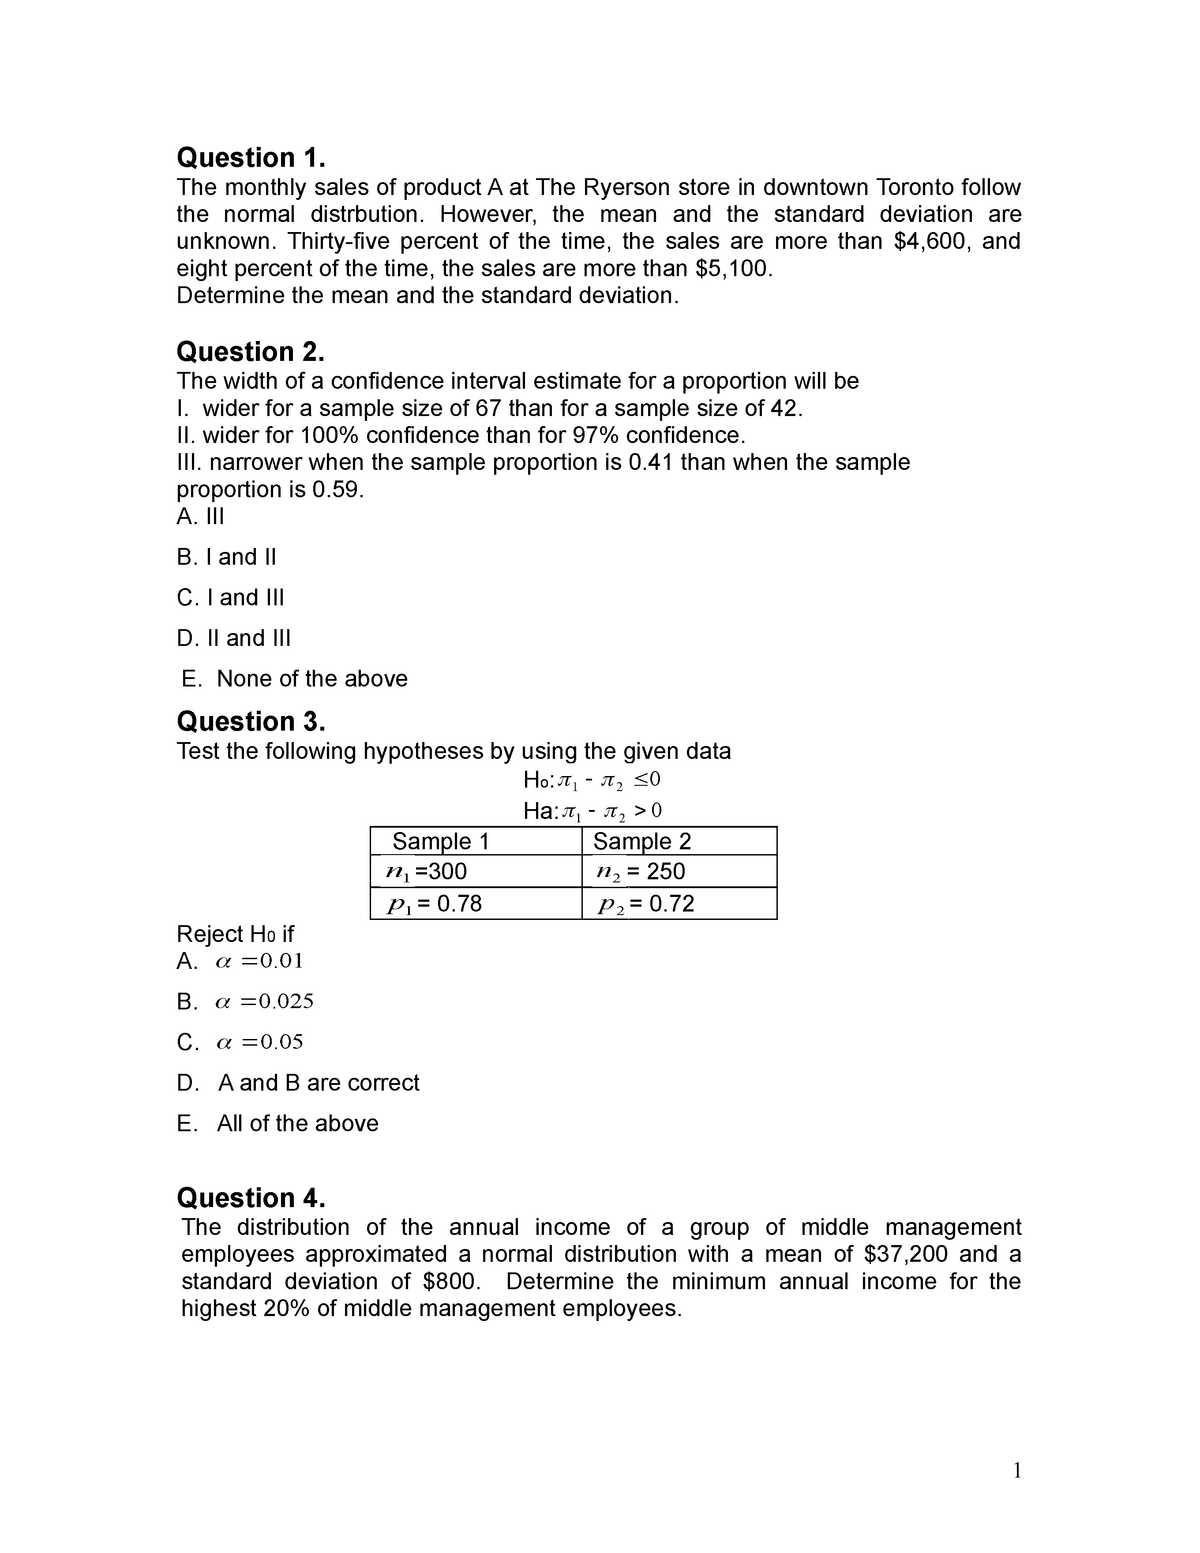 Exam 2014 - QMS 202: Business Statistics II - StuDocu